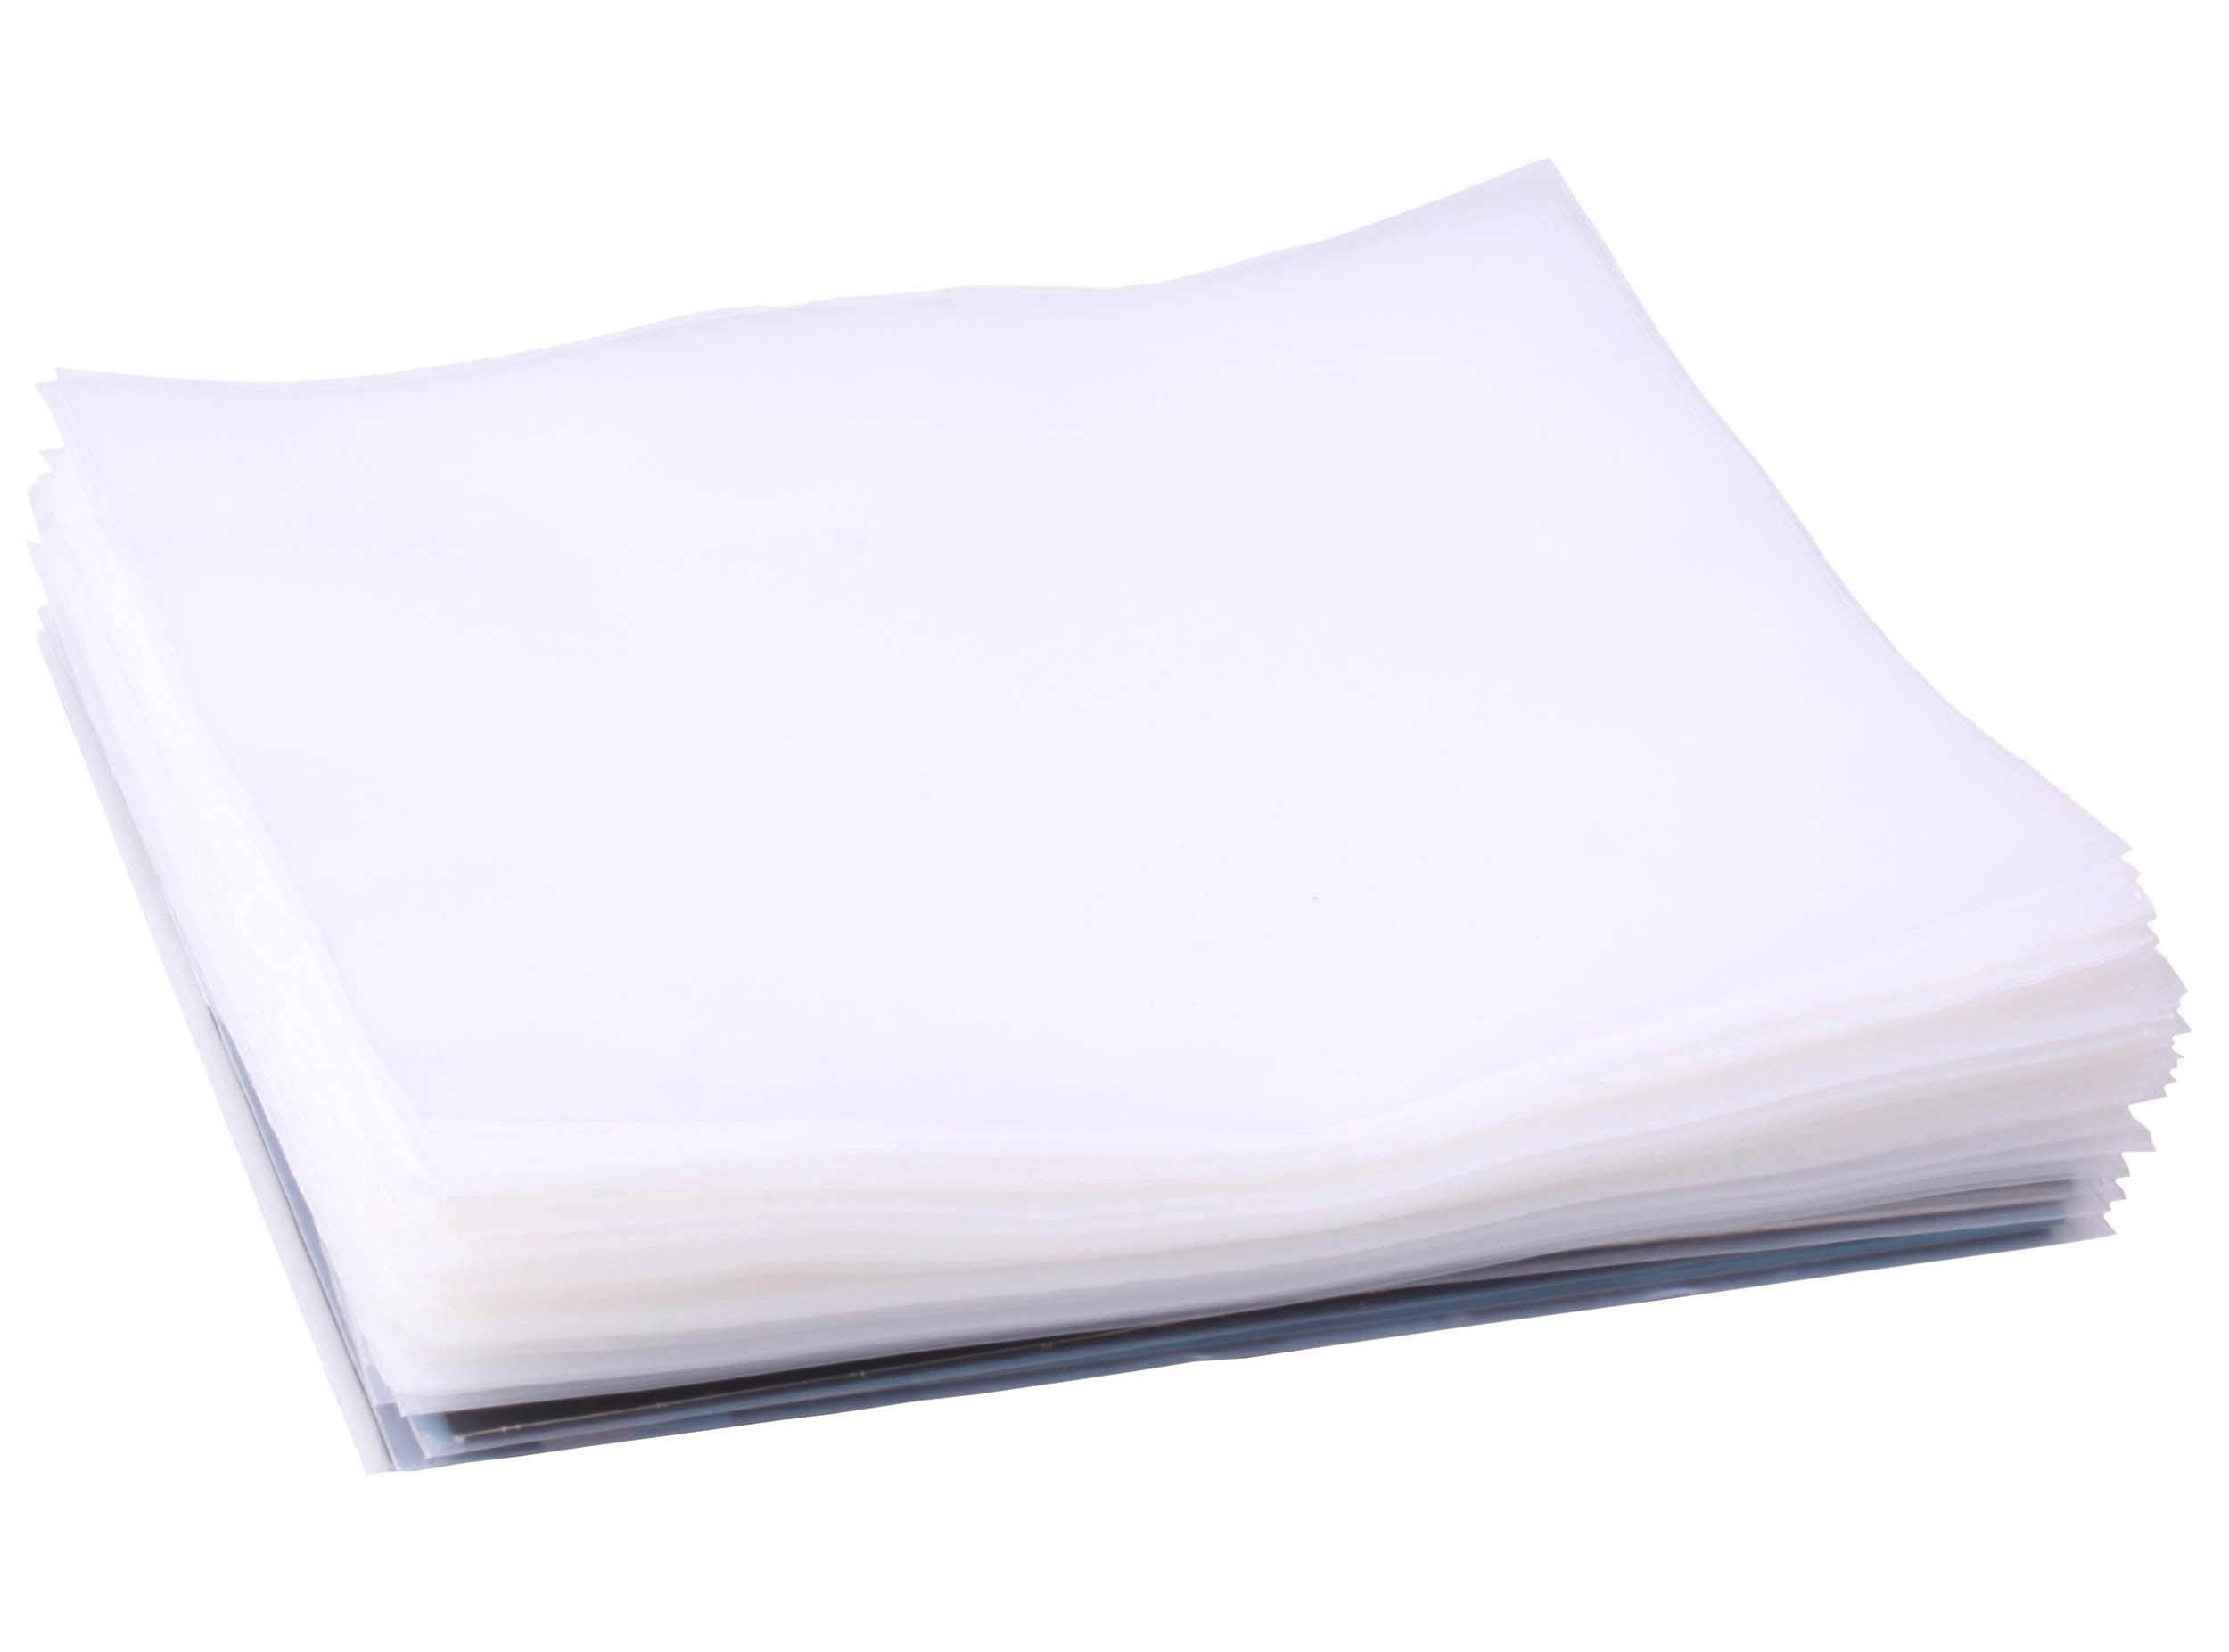 ZOMO 7 inch vinyl protective covers